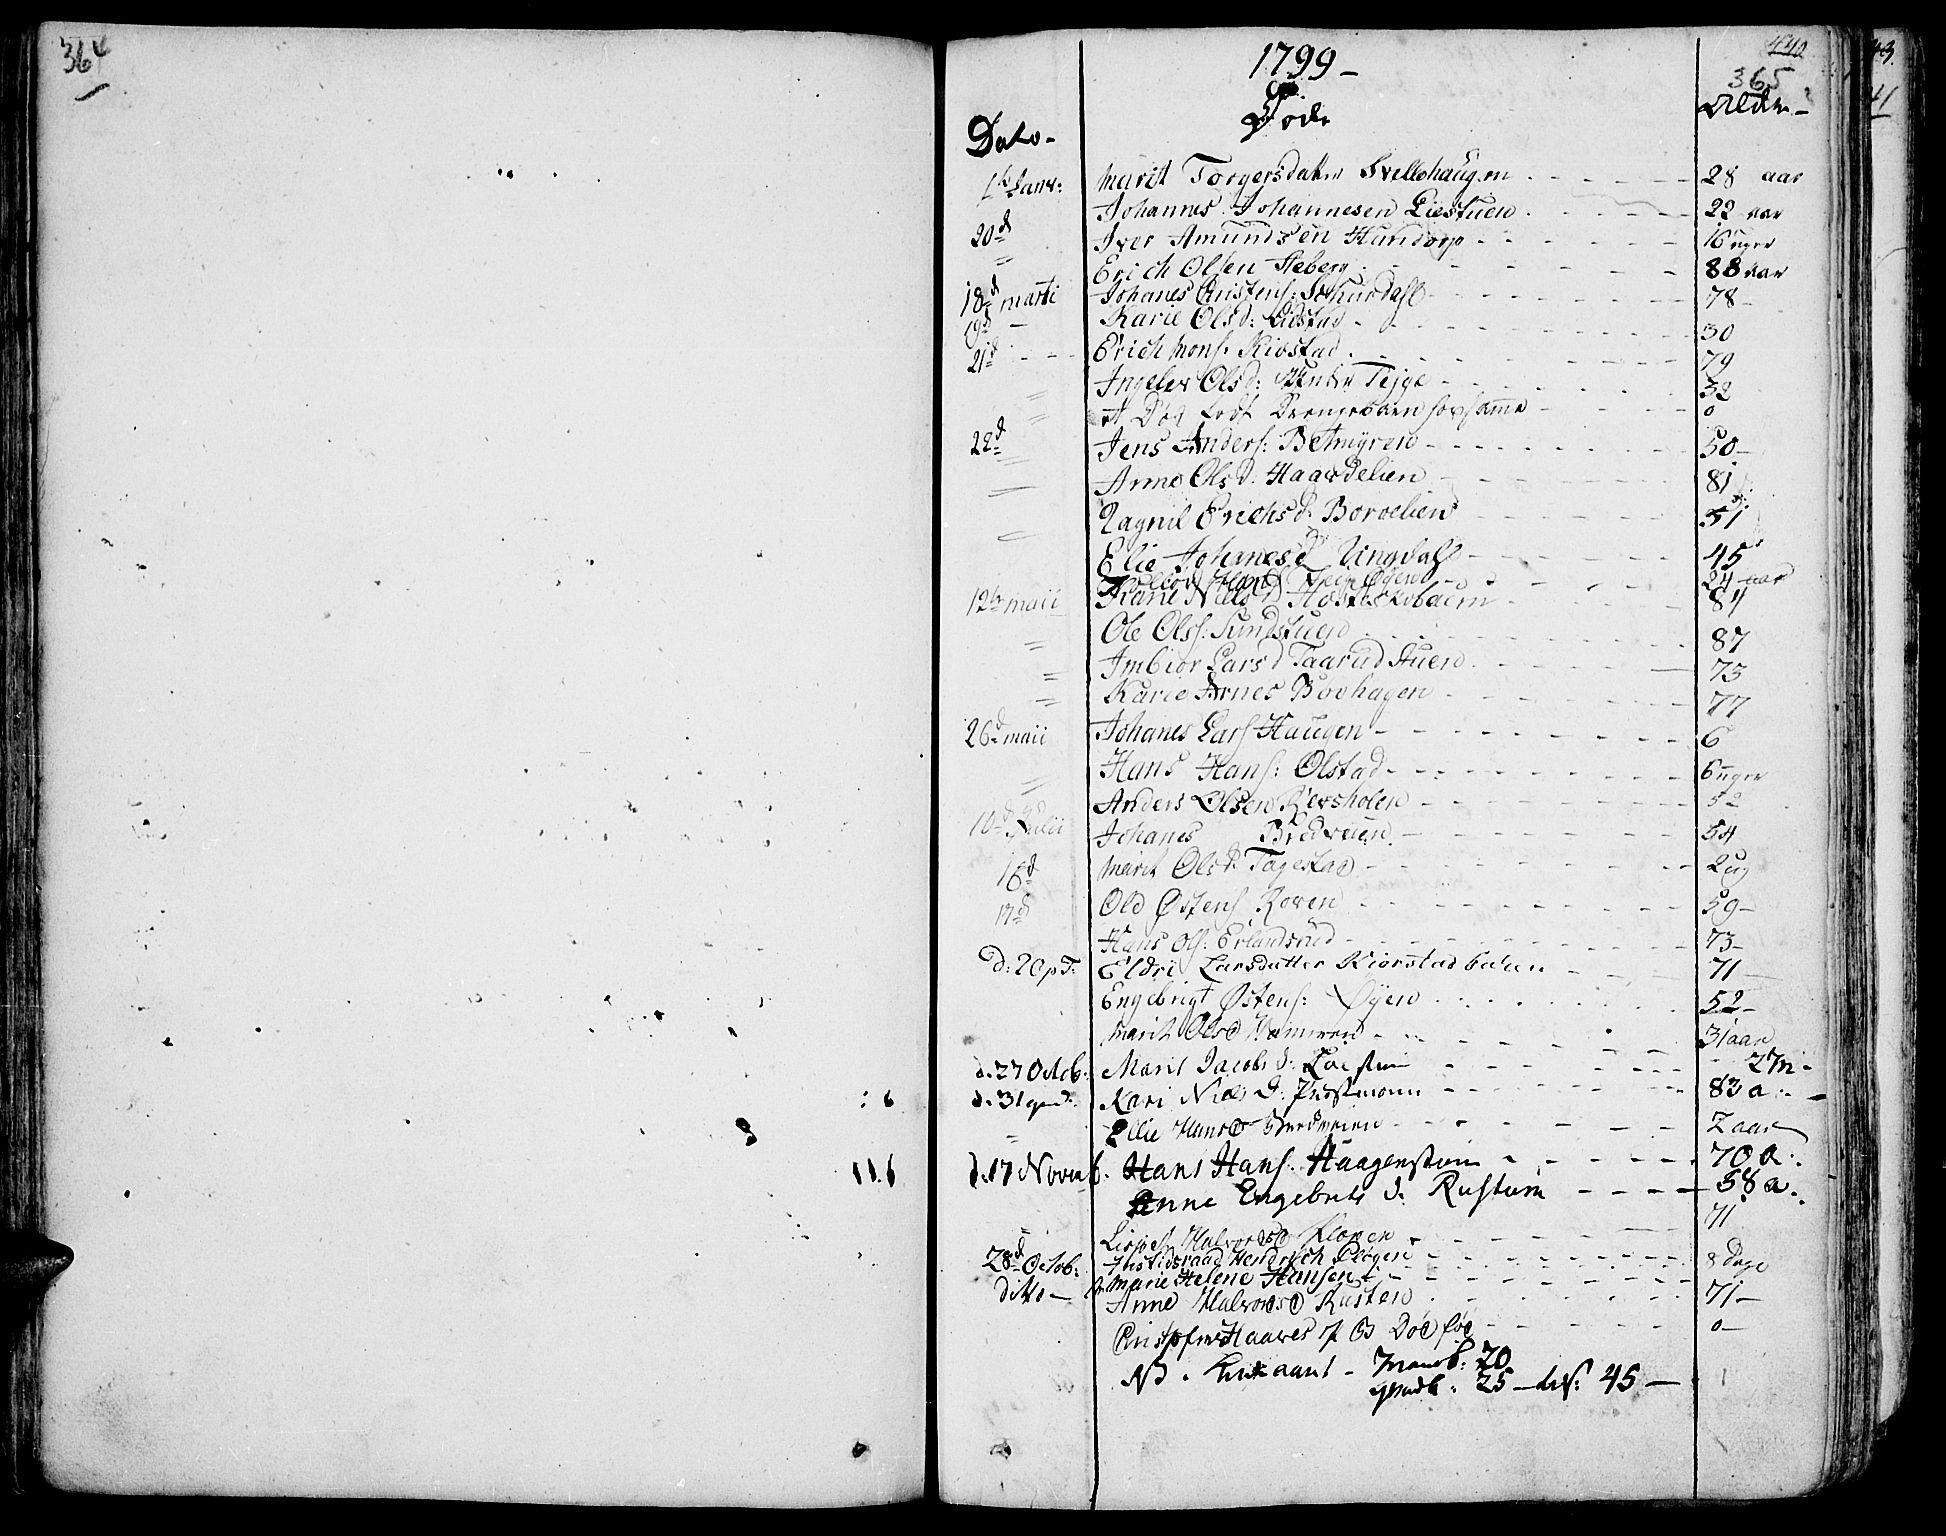 SAH, Fron prestekontor, H/Ha/Haa/L0001: Ministerialbok nr. 1, 1799-1816, s. 364-365